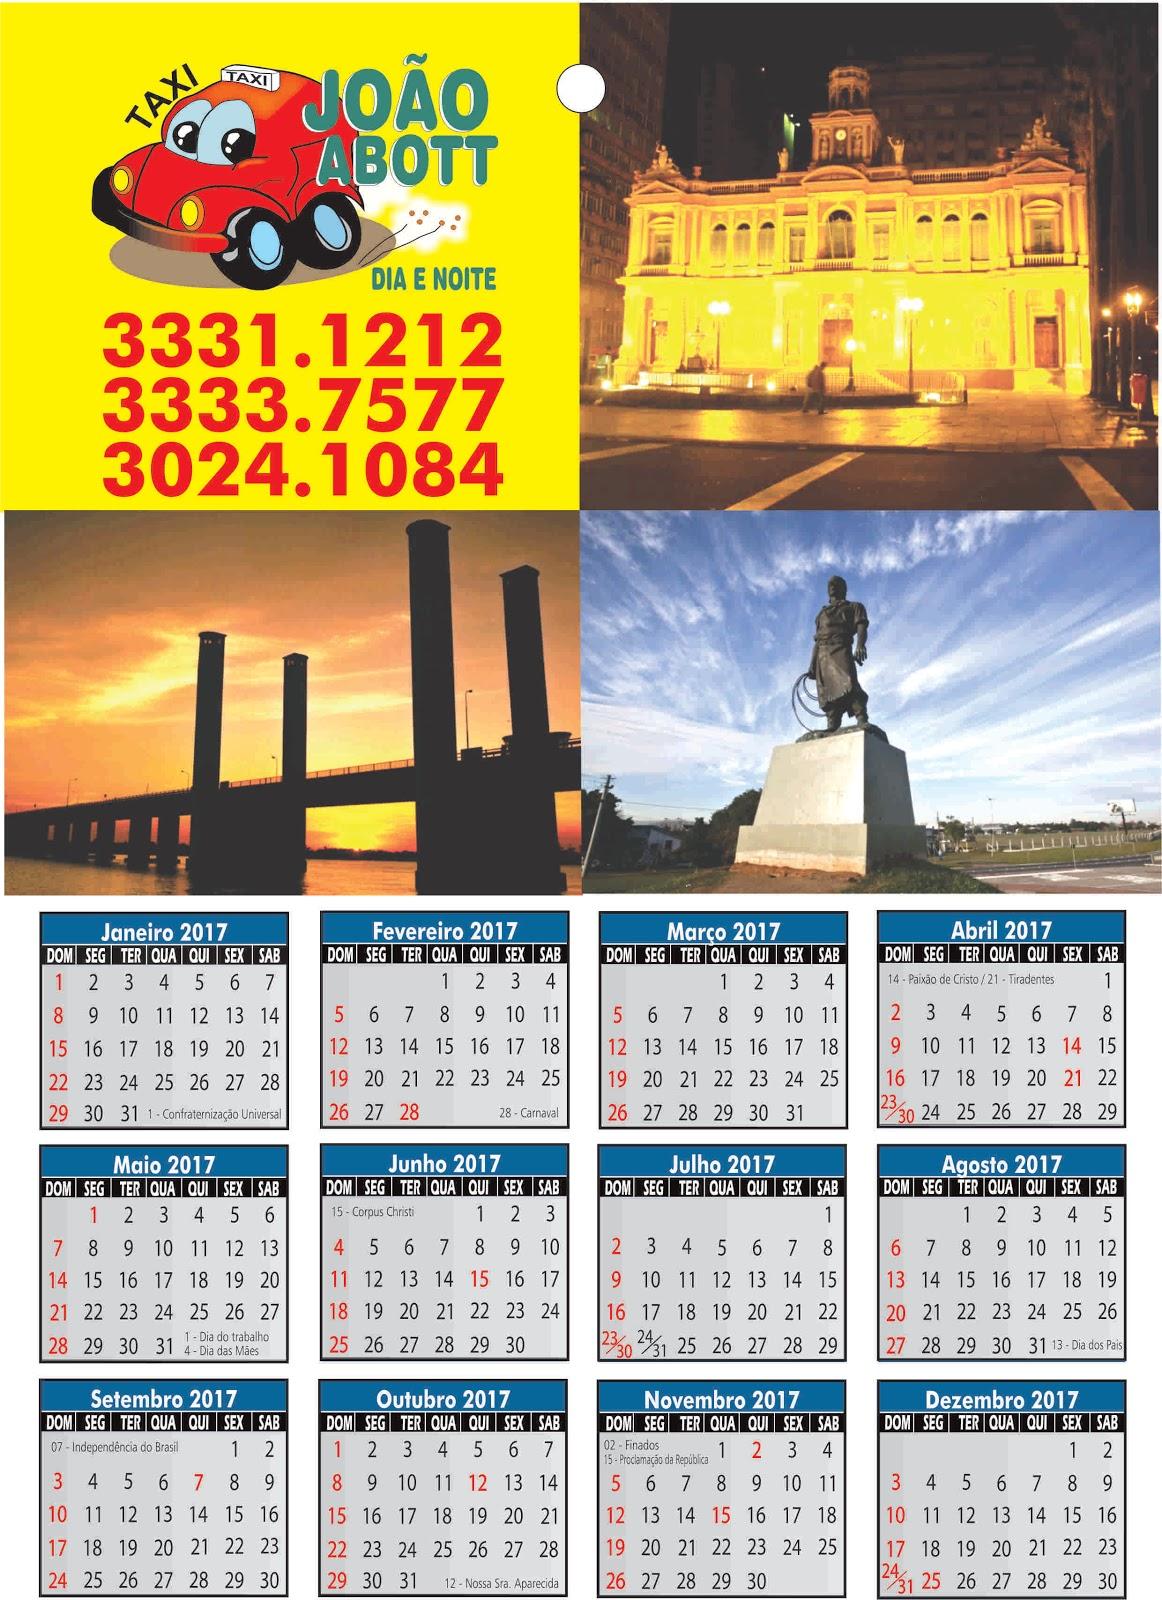 3.bp.blogspot.com/-zogGXujtgKI/XCgnNyxJCKI/AAAAAAAAB_0/mLxeBxcr60ML59qDaTWvNANFQhVb8SZYwCKgBGAs/s1600/Calendario%2BPessi3.jpg